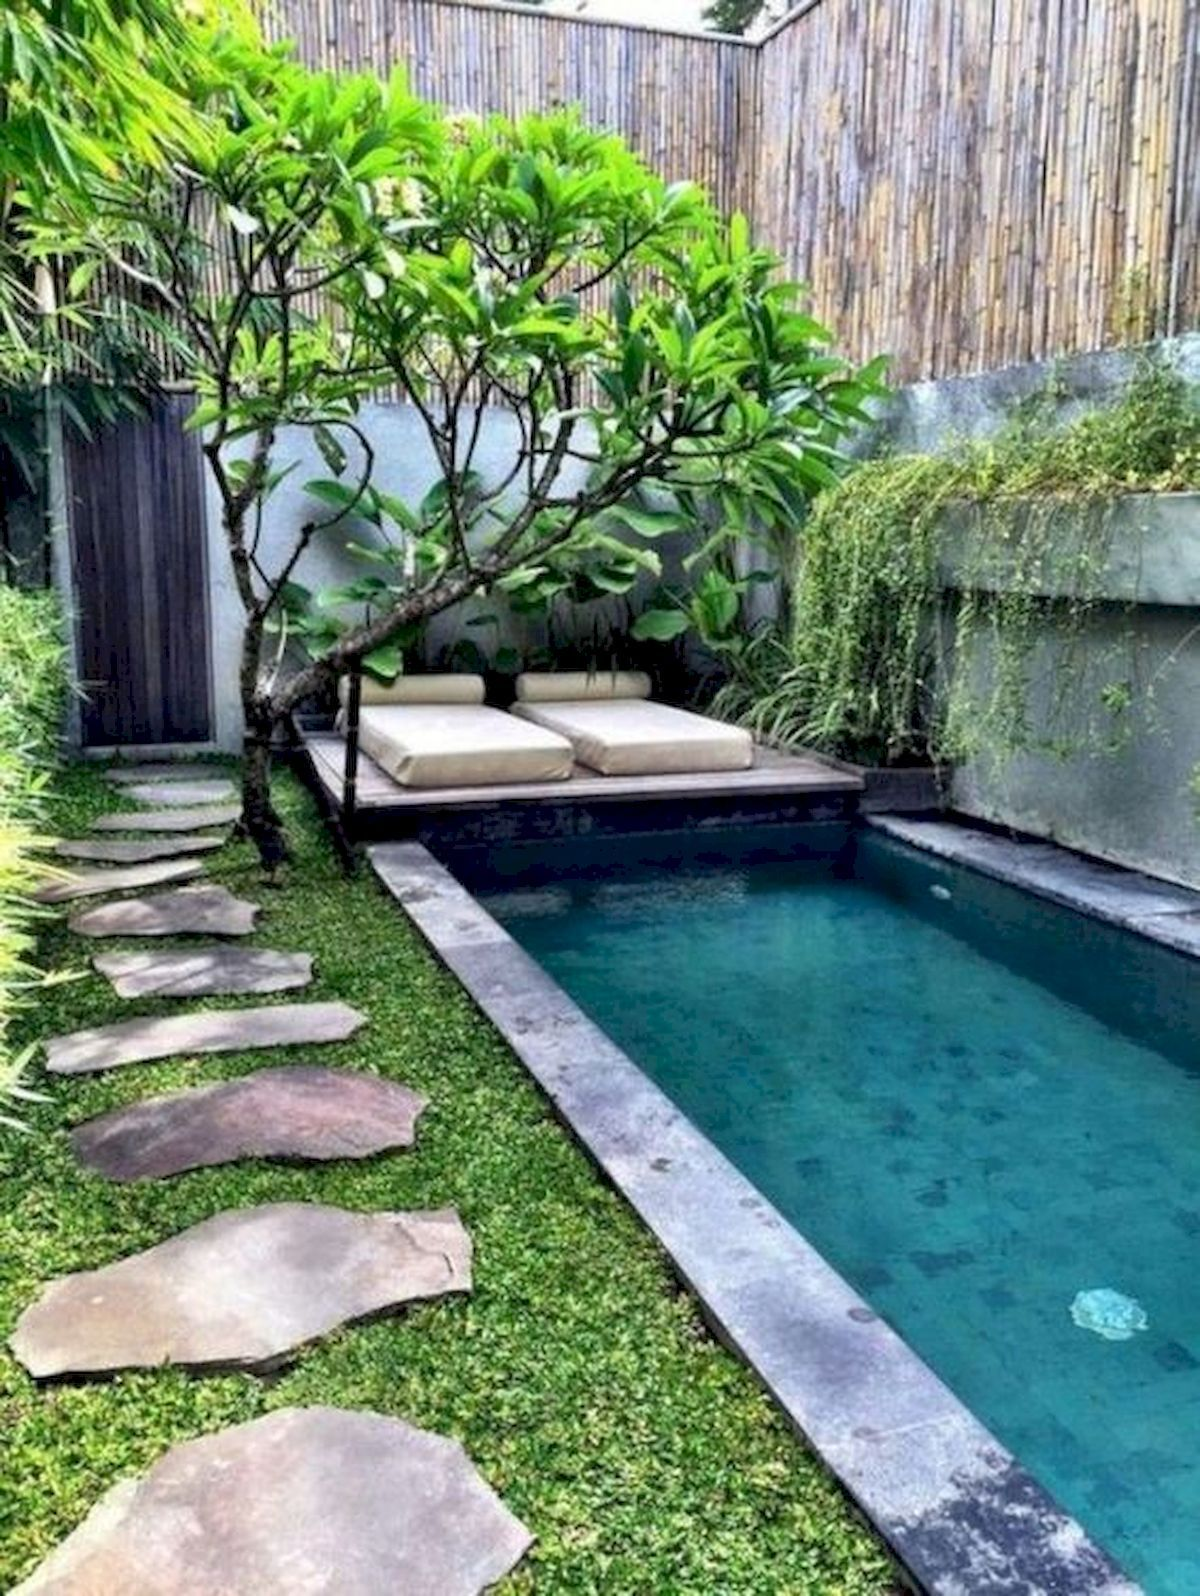 50 Gorgeous Small Swimming Pool Ideas for Small Backyard #poolimgartenideen